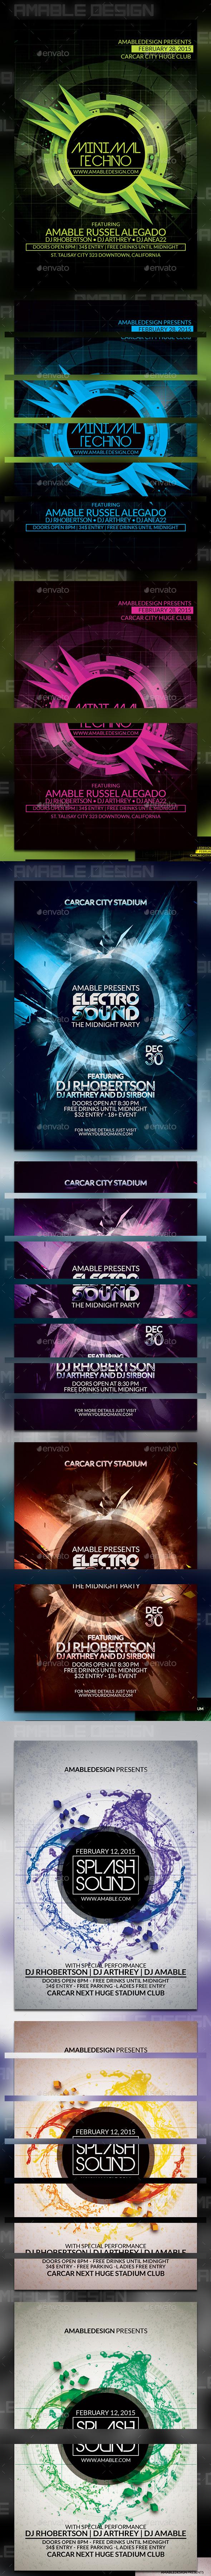 3 PSD Party Sound Flyer Bundle - Clubs & Parties Events